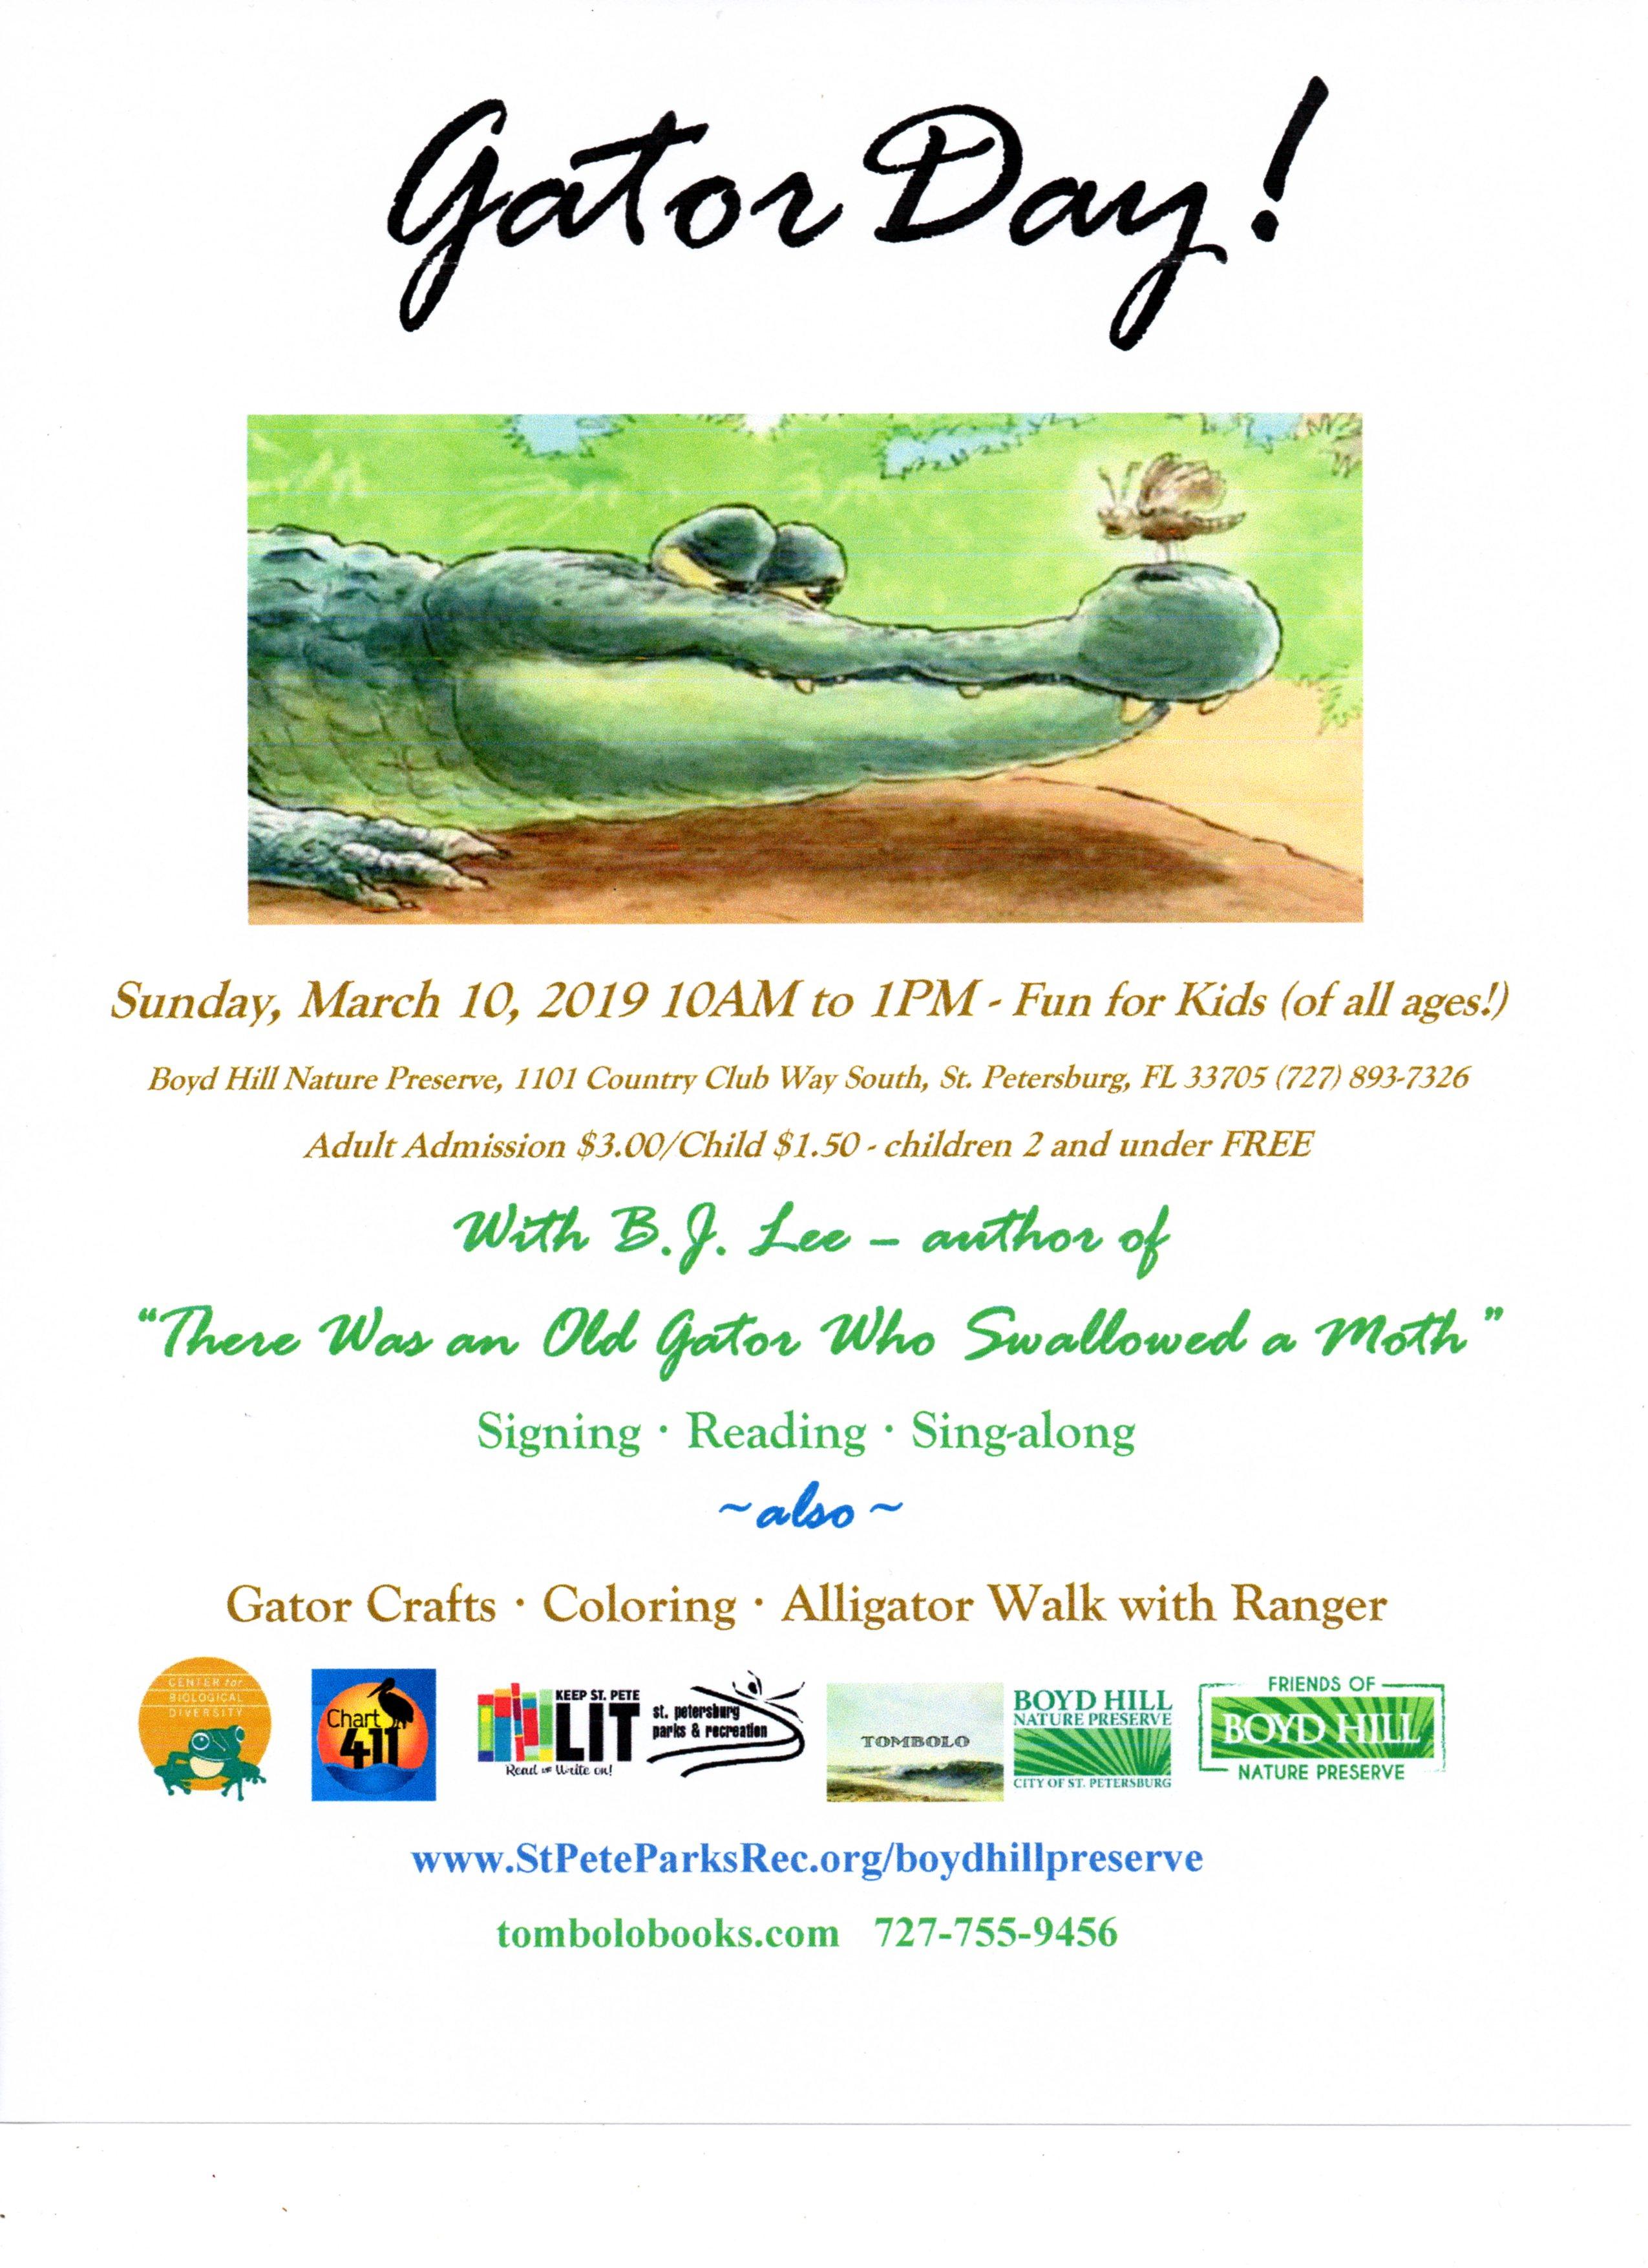 Gator Day Flyer 3 10 19 final